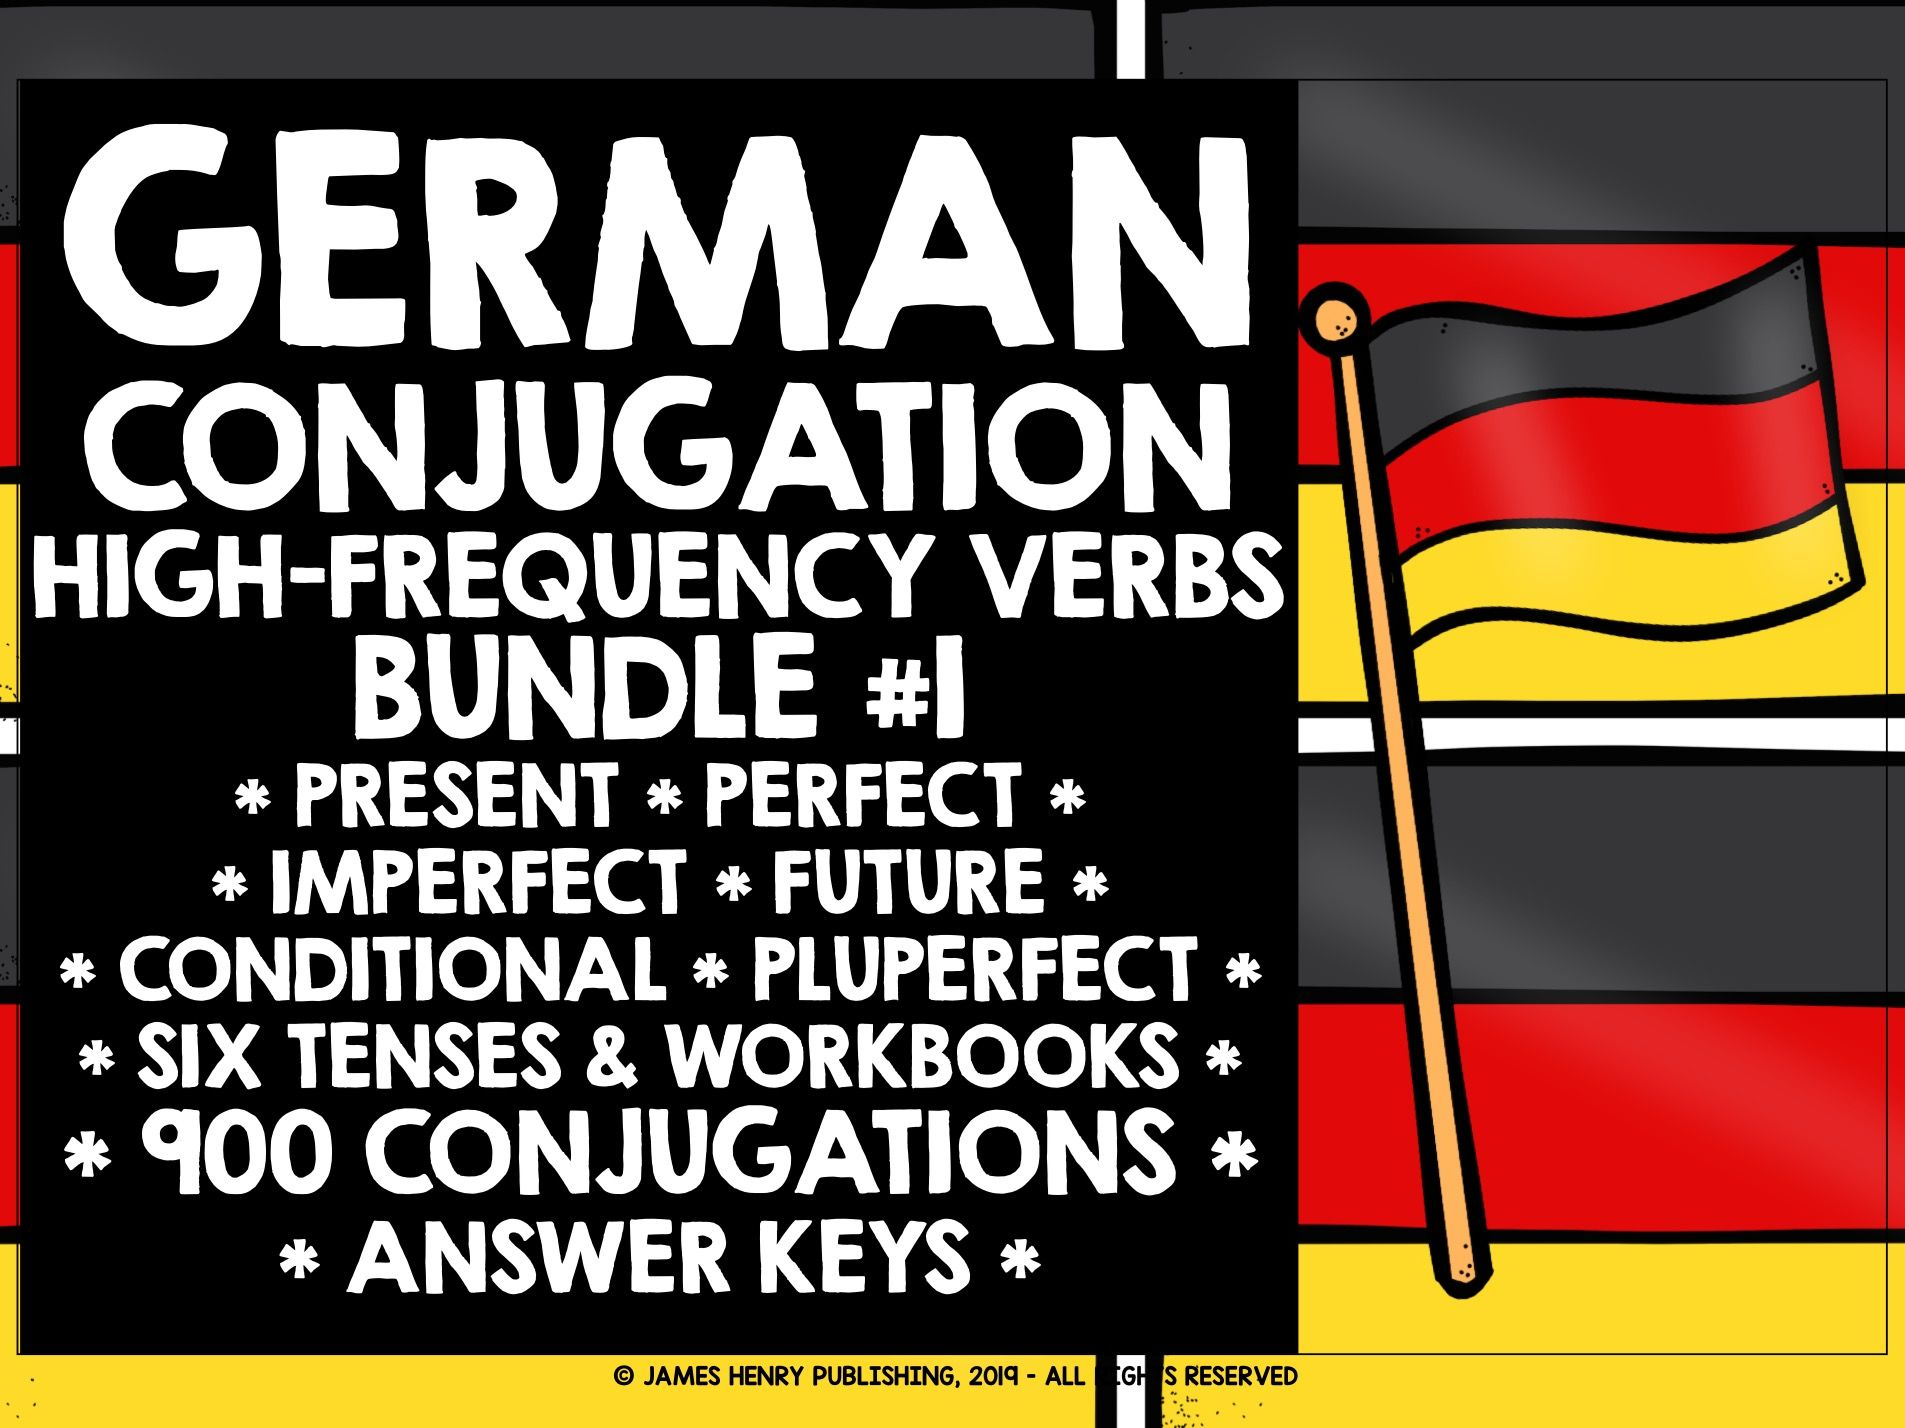 GERMAN HIGH-FREQUENCY VERBS CONJUGATION BUNDLE #1